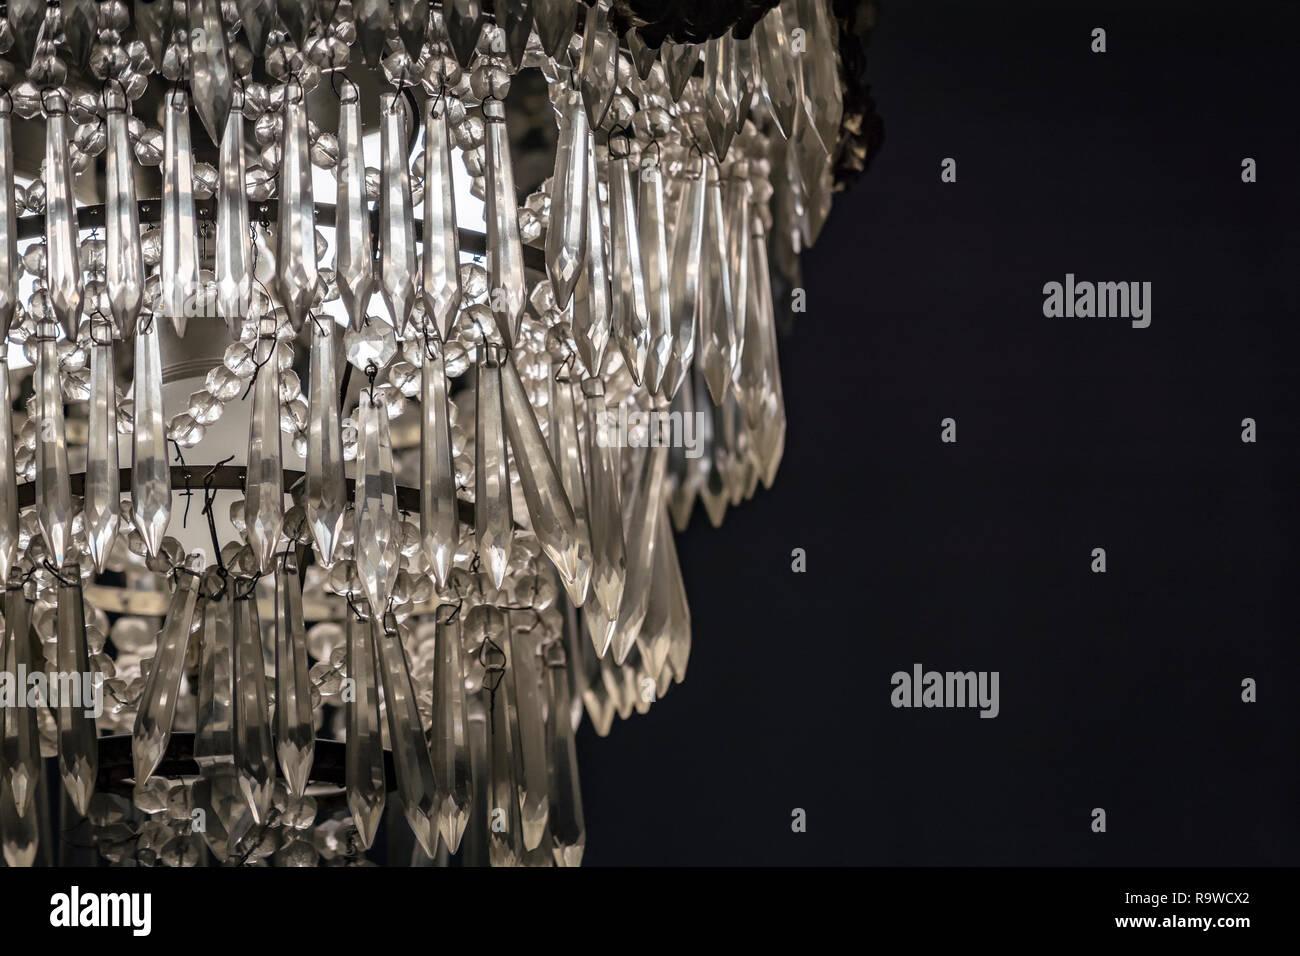 Kronleuchter Glaskristalle ~ Kronleuchter lampe stockfotos kronleuchter lampe bilder alamy